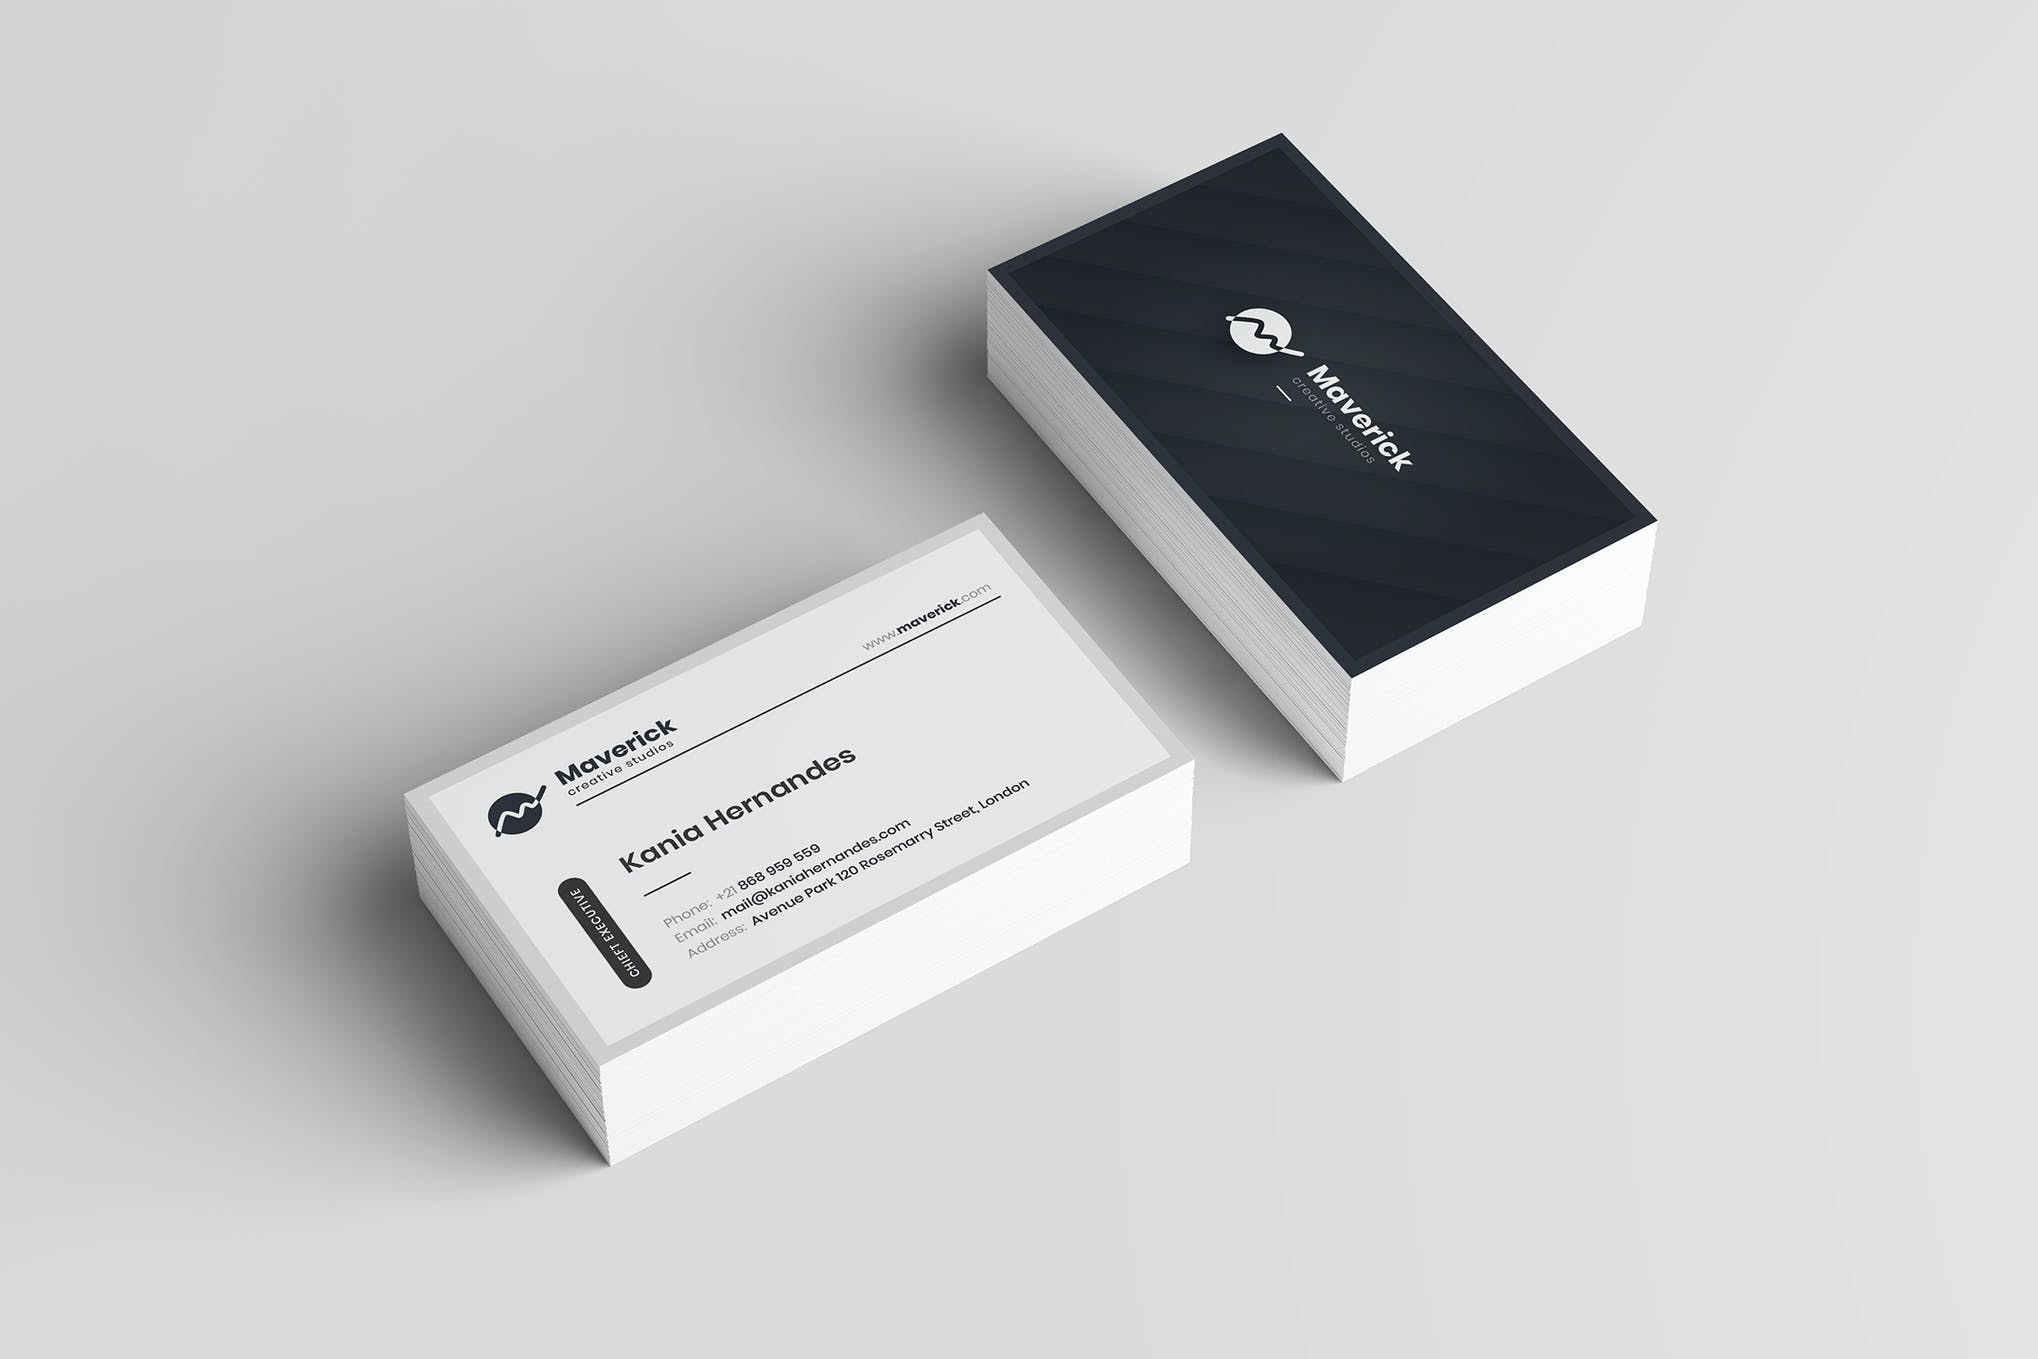 custom-printed business cards in Calgary